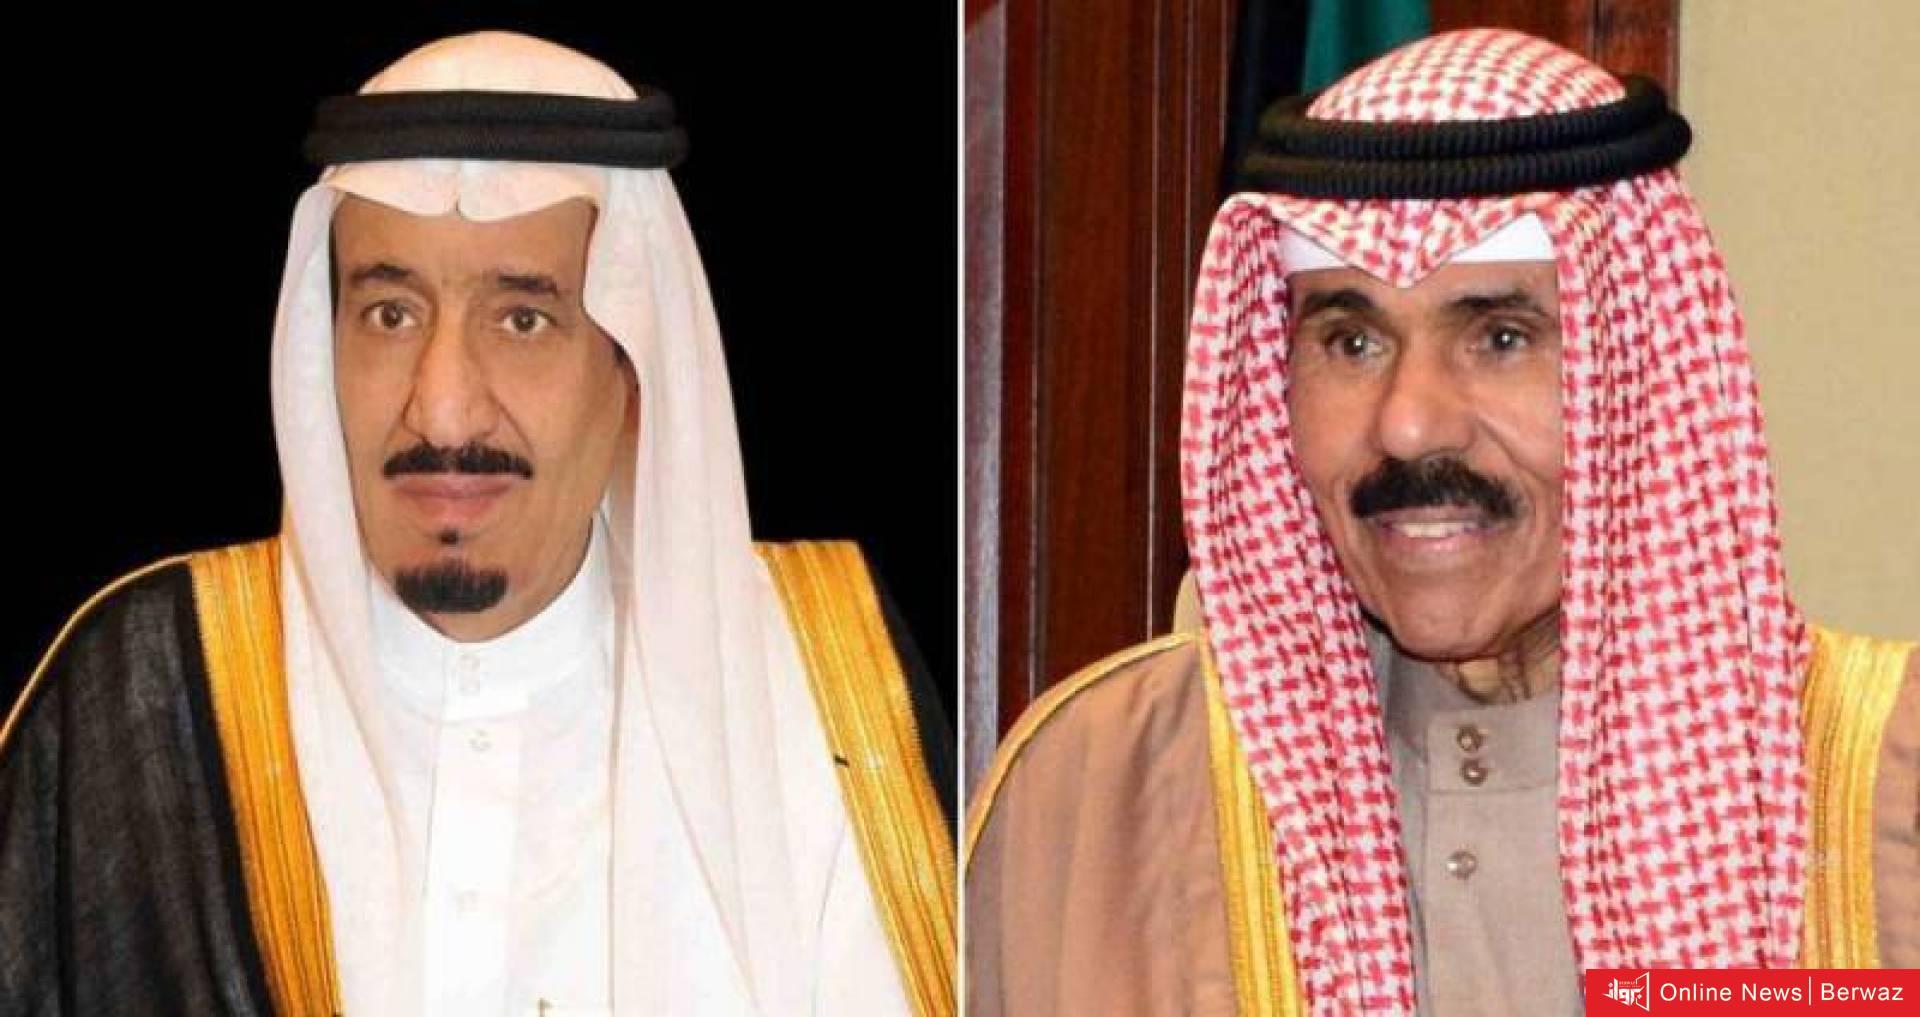 2 543293 highres - رسائل أميرية كويتية إلى خادم الحرمين للتهنئة بالذكرى السادسة على توليه مقاليد الحكم